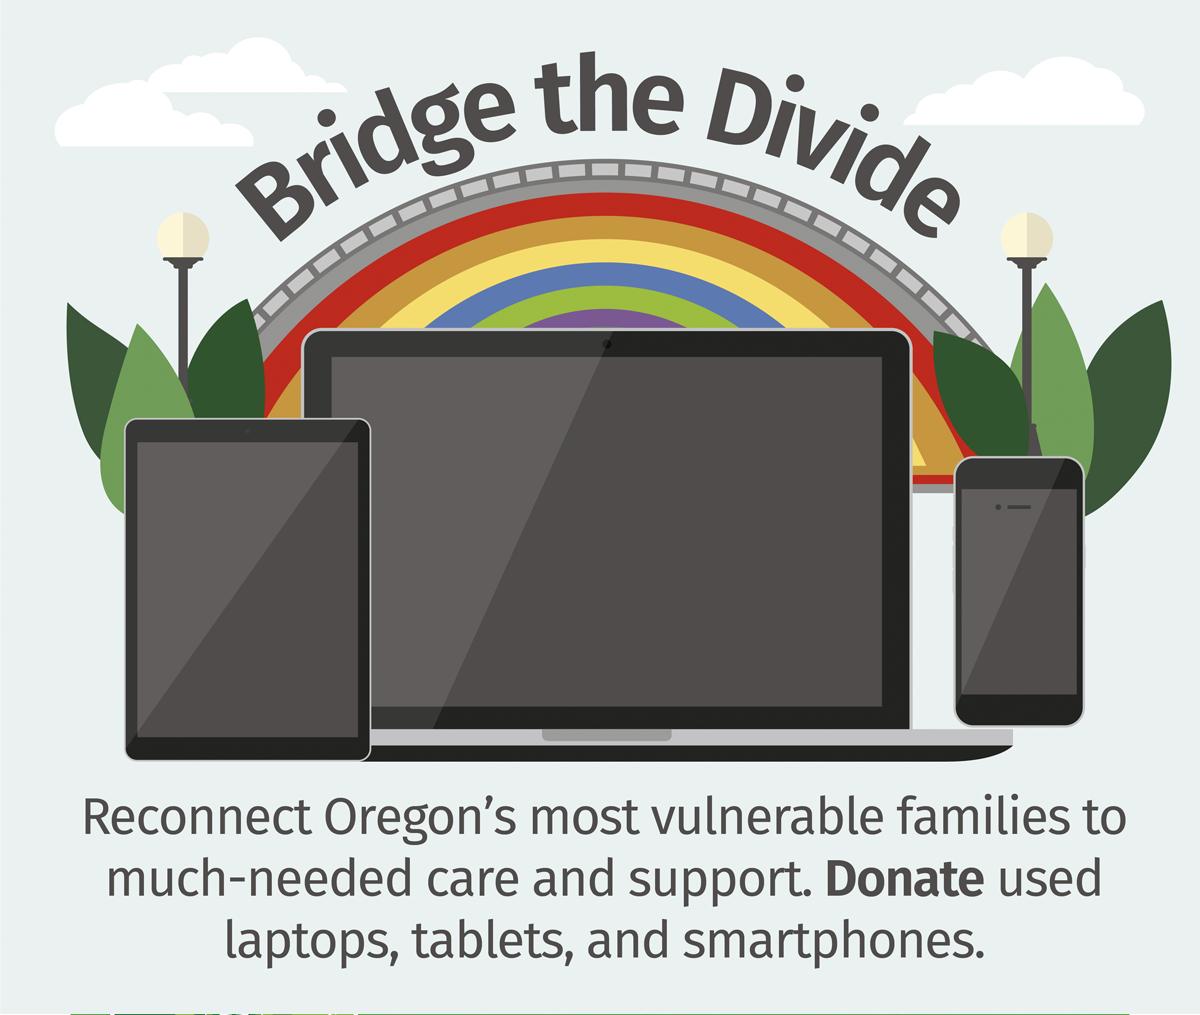 Bridge the Divide in Southern Oregon